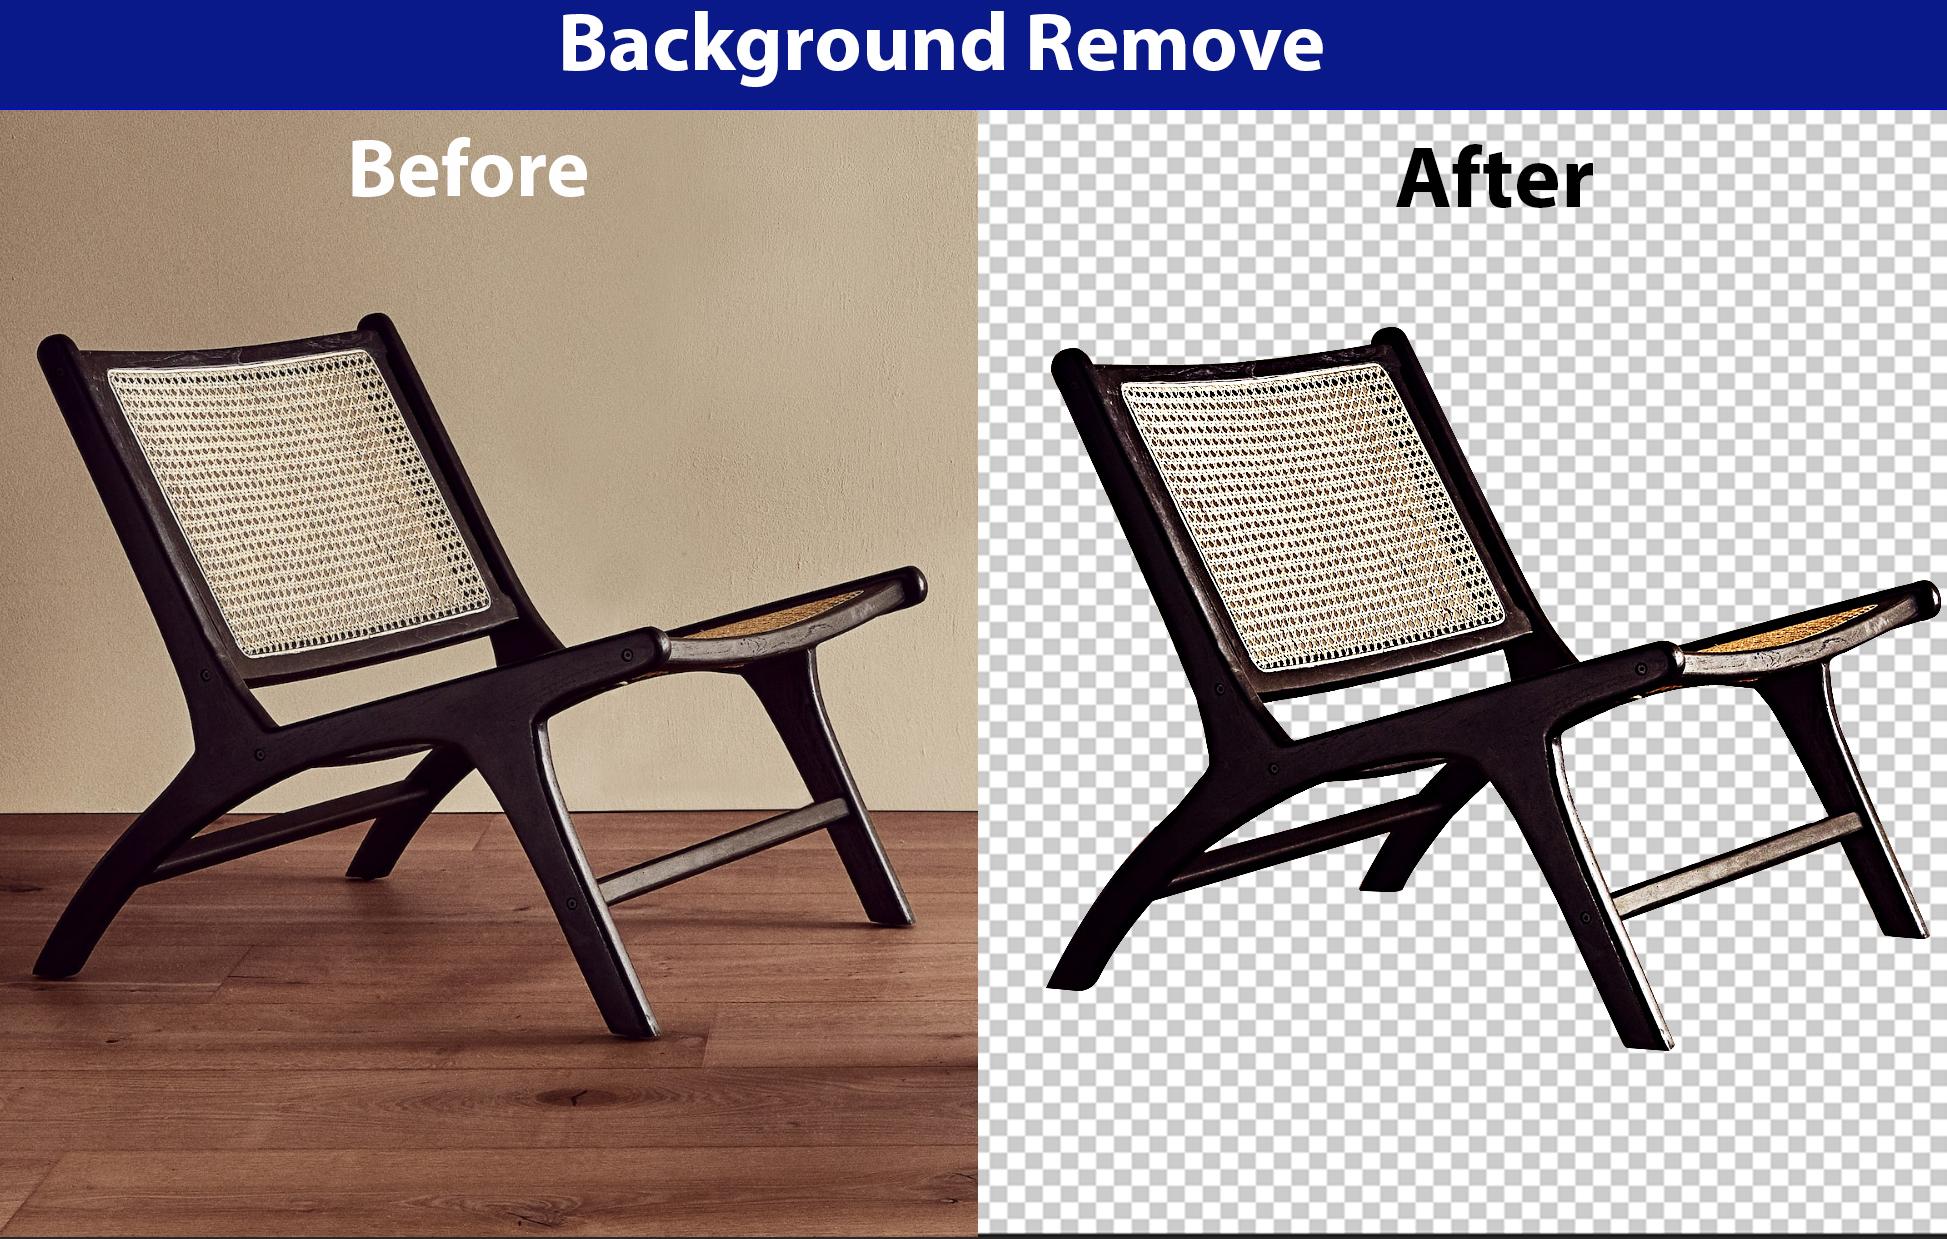 I will do photo editing, background remove, retouch, resize, professionally 5 image